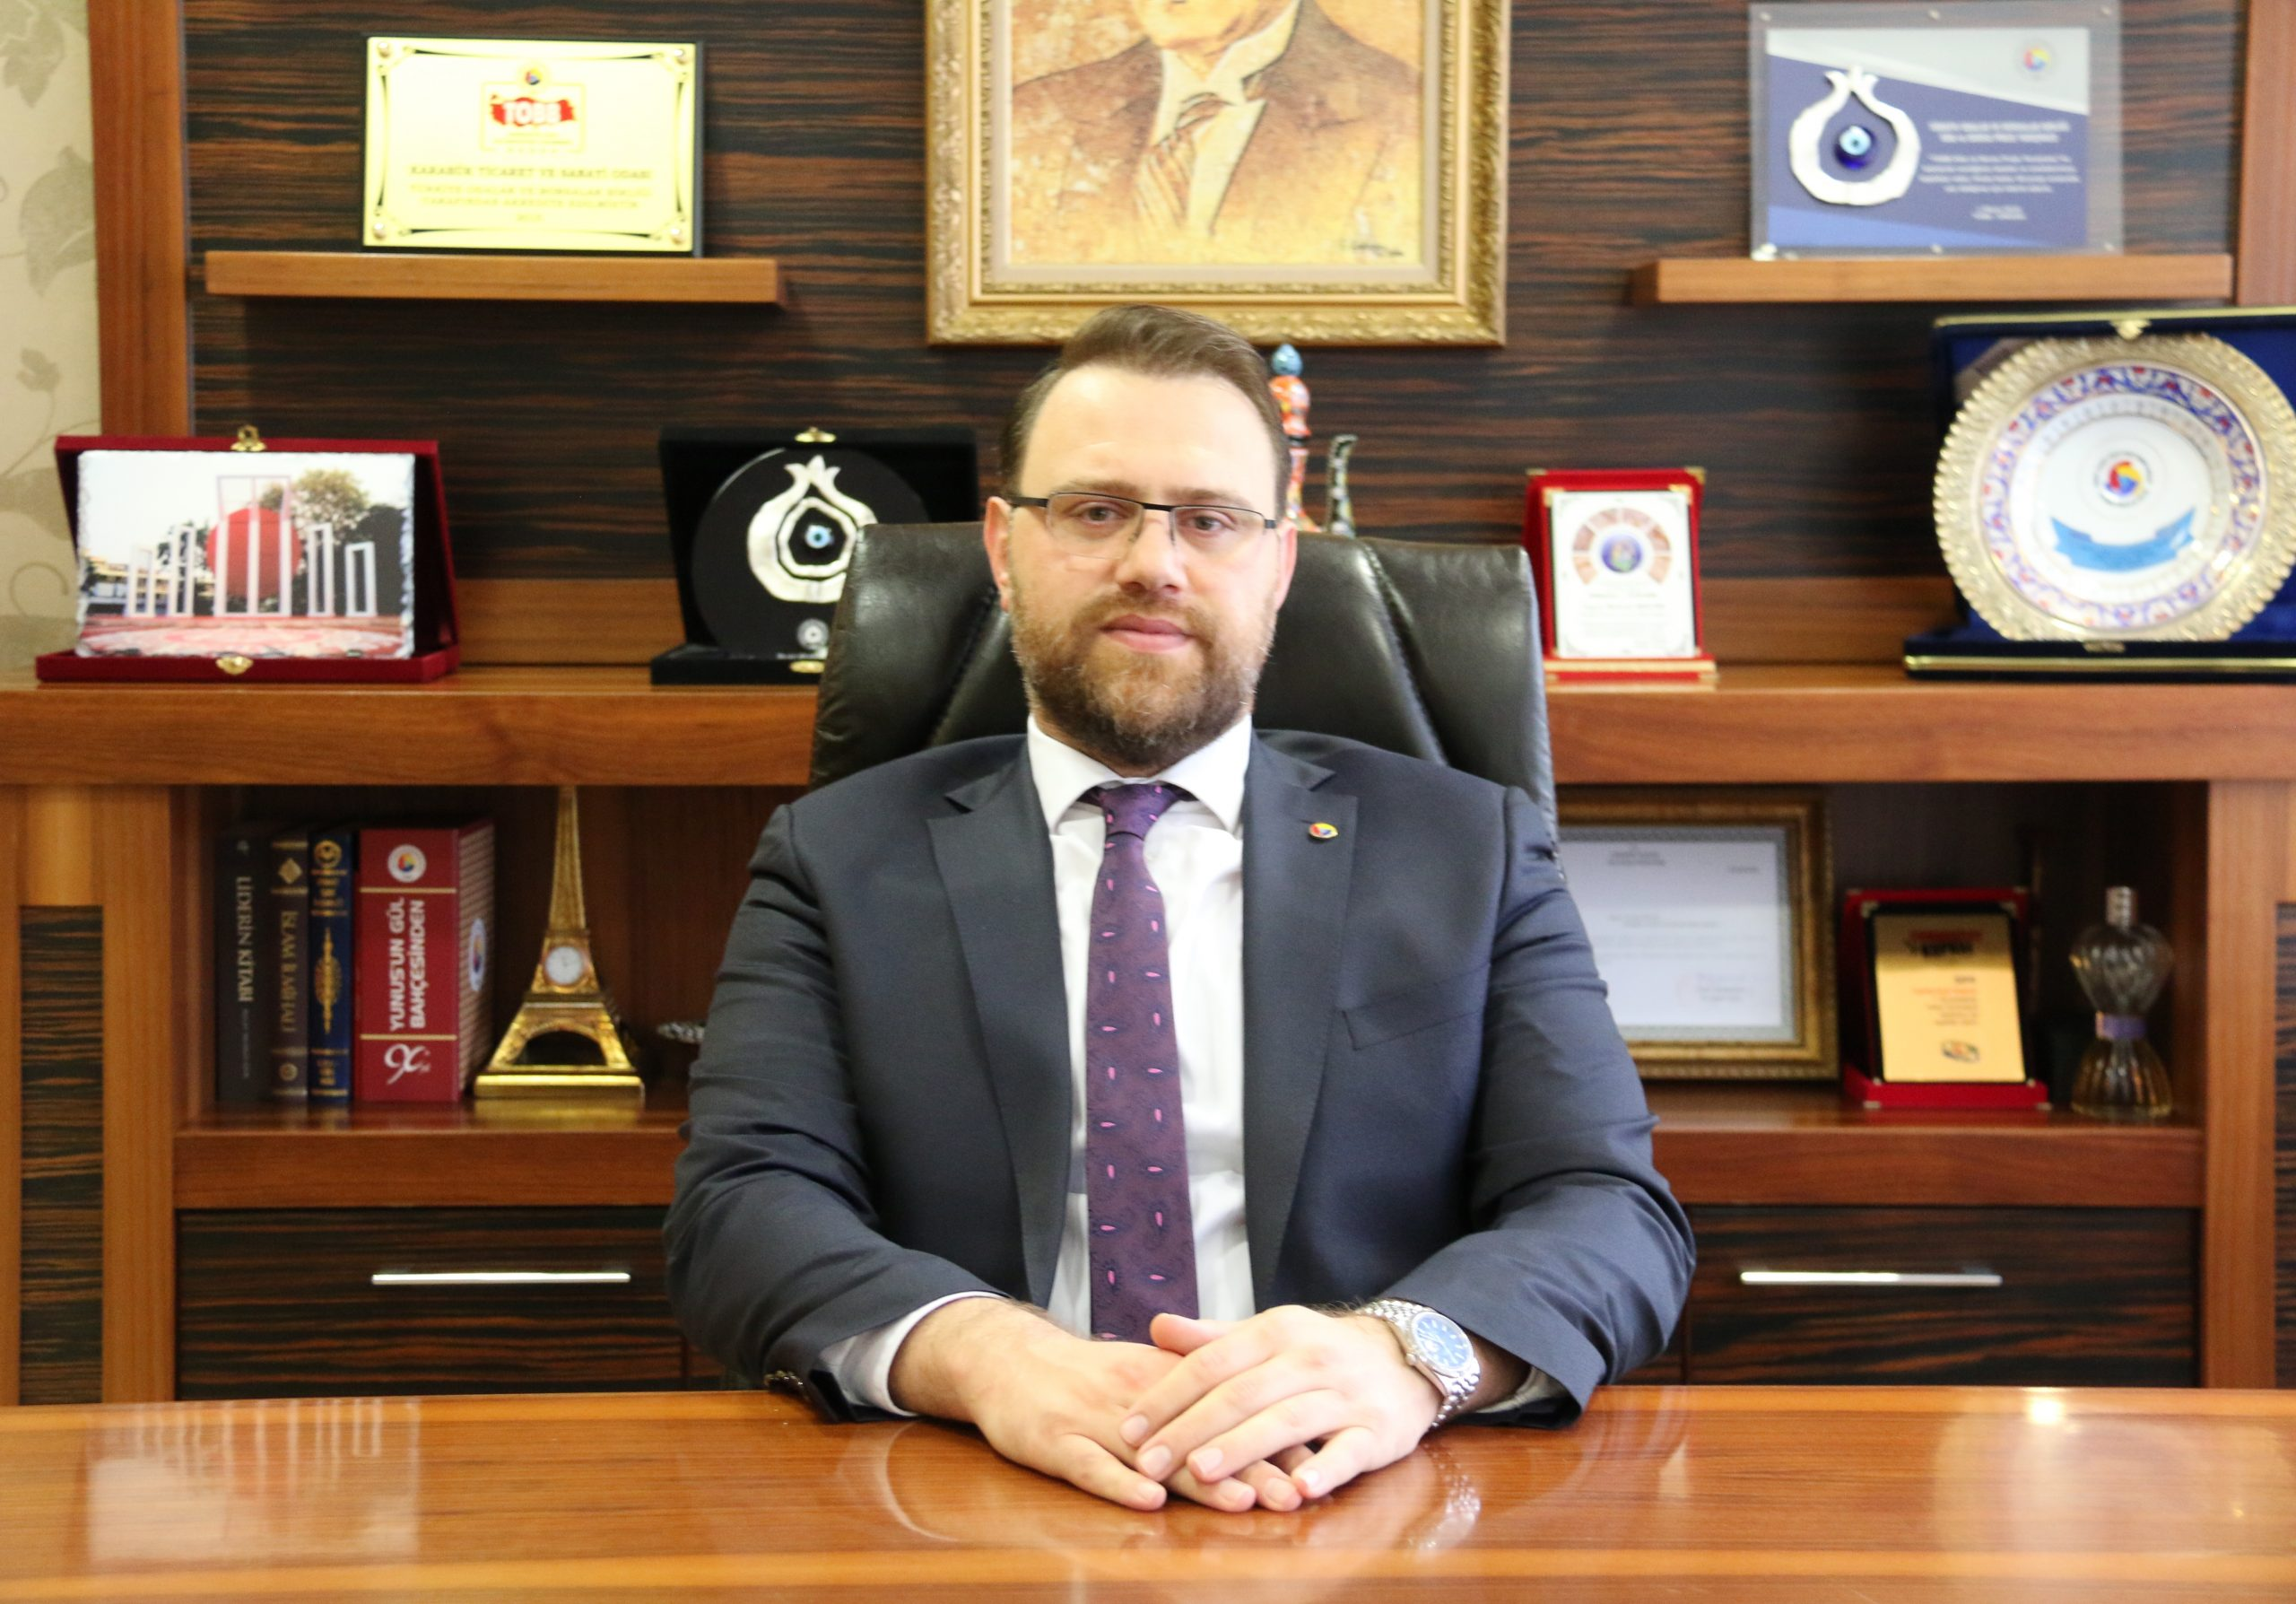 İSO İKİNCİ 500'DE İLİMİZDE FAALİYET GÖSTEREN 5 ŞİRKET YER ALDI